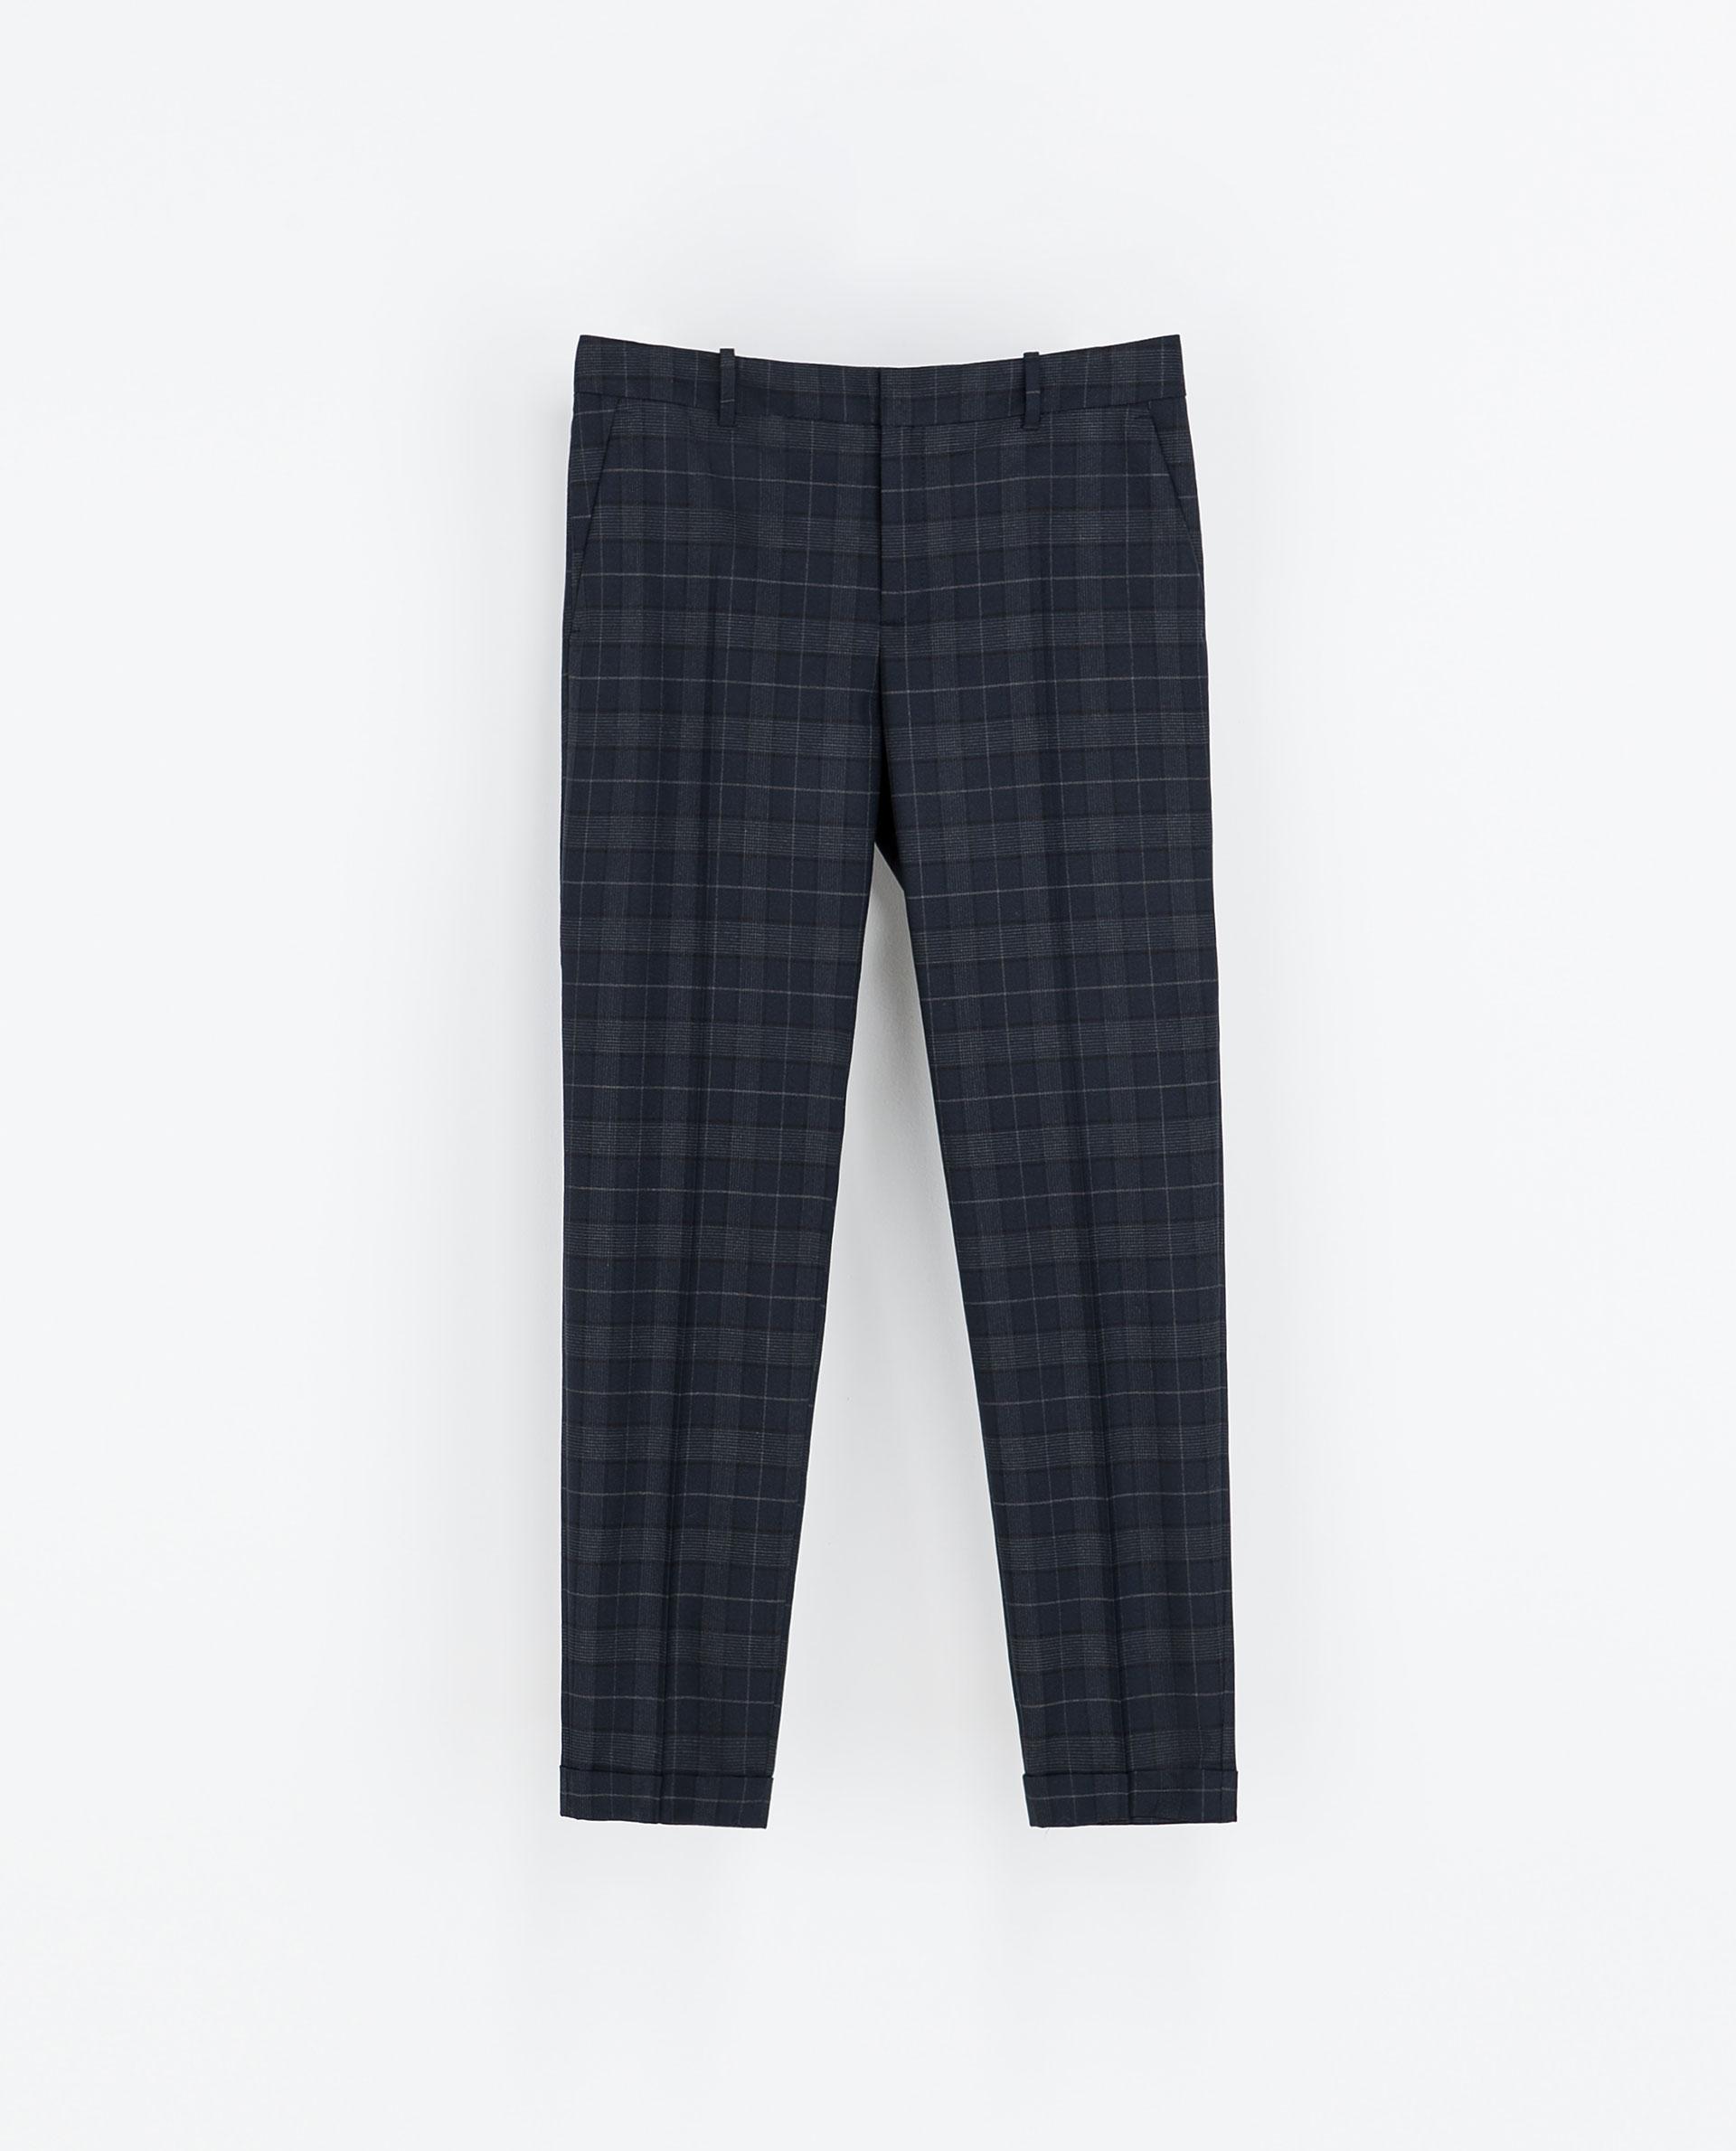 plaid pants zara - Pi Pants